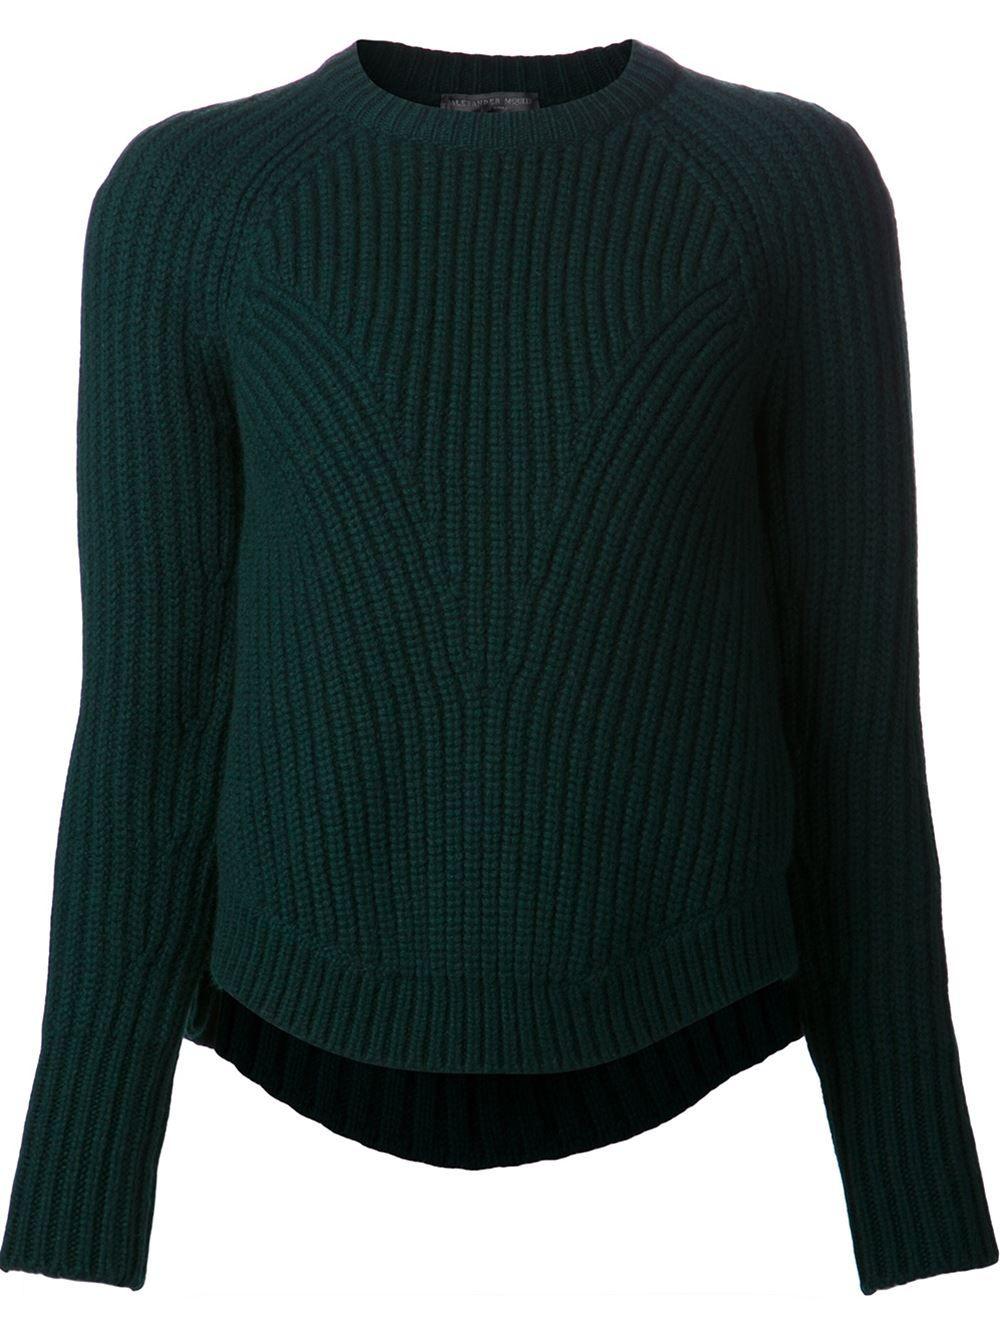 1cb84b9b5d95e0 Alexander Mcqueen Thick Ribbed Sweater - Hirshleifers - Farfetch.com ...